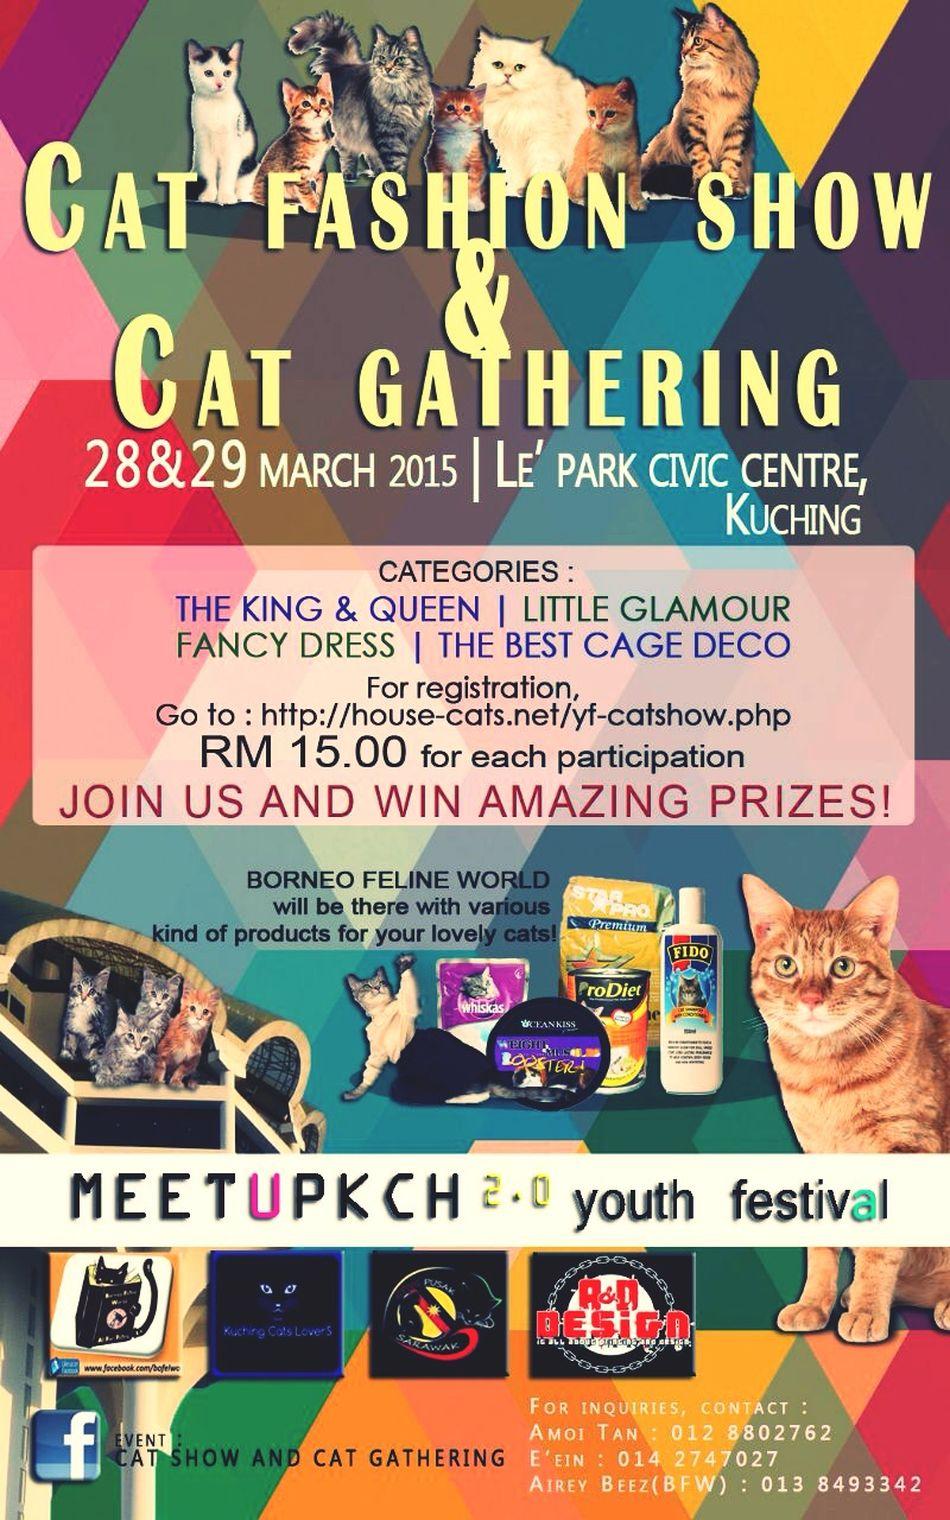 Kuchingcatslovers Cat Lovers Catlovers Kuching Cats Lovers jom guys.. Join us.,, cat show and cat gathering on 28/03/15-29/03/15 Cat Show Cat Gathering Cats Cat